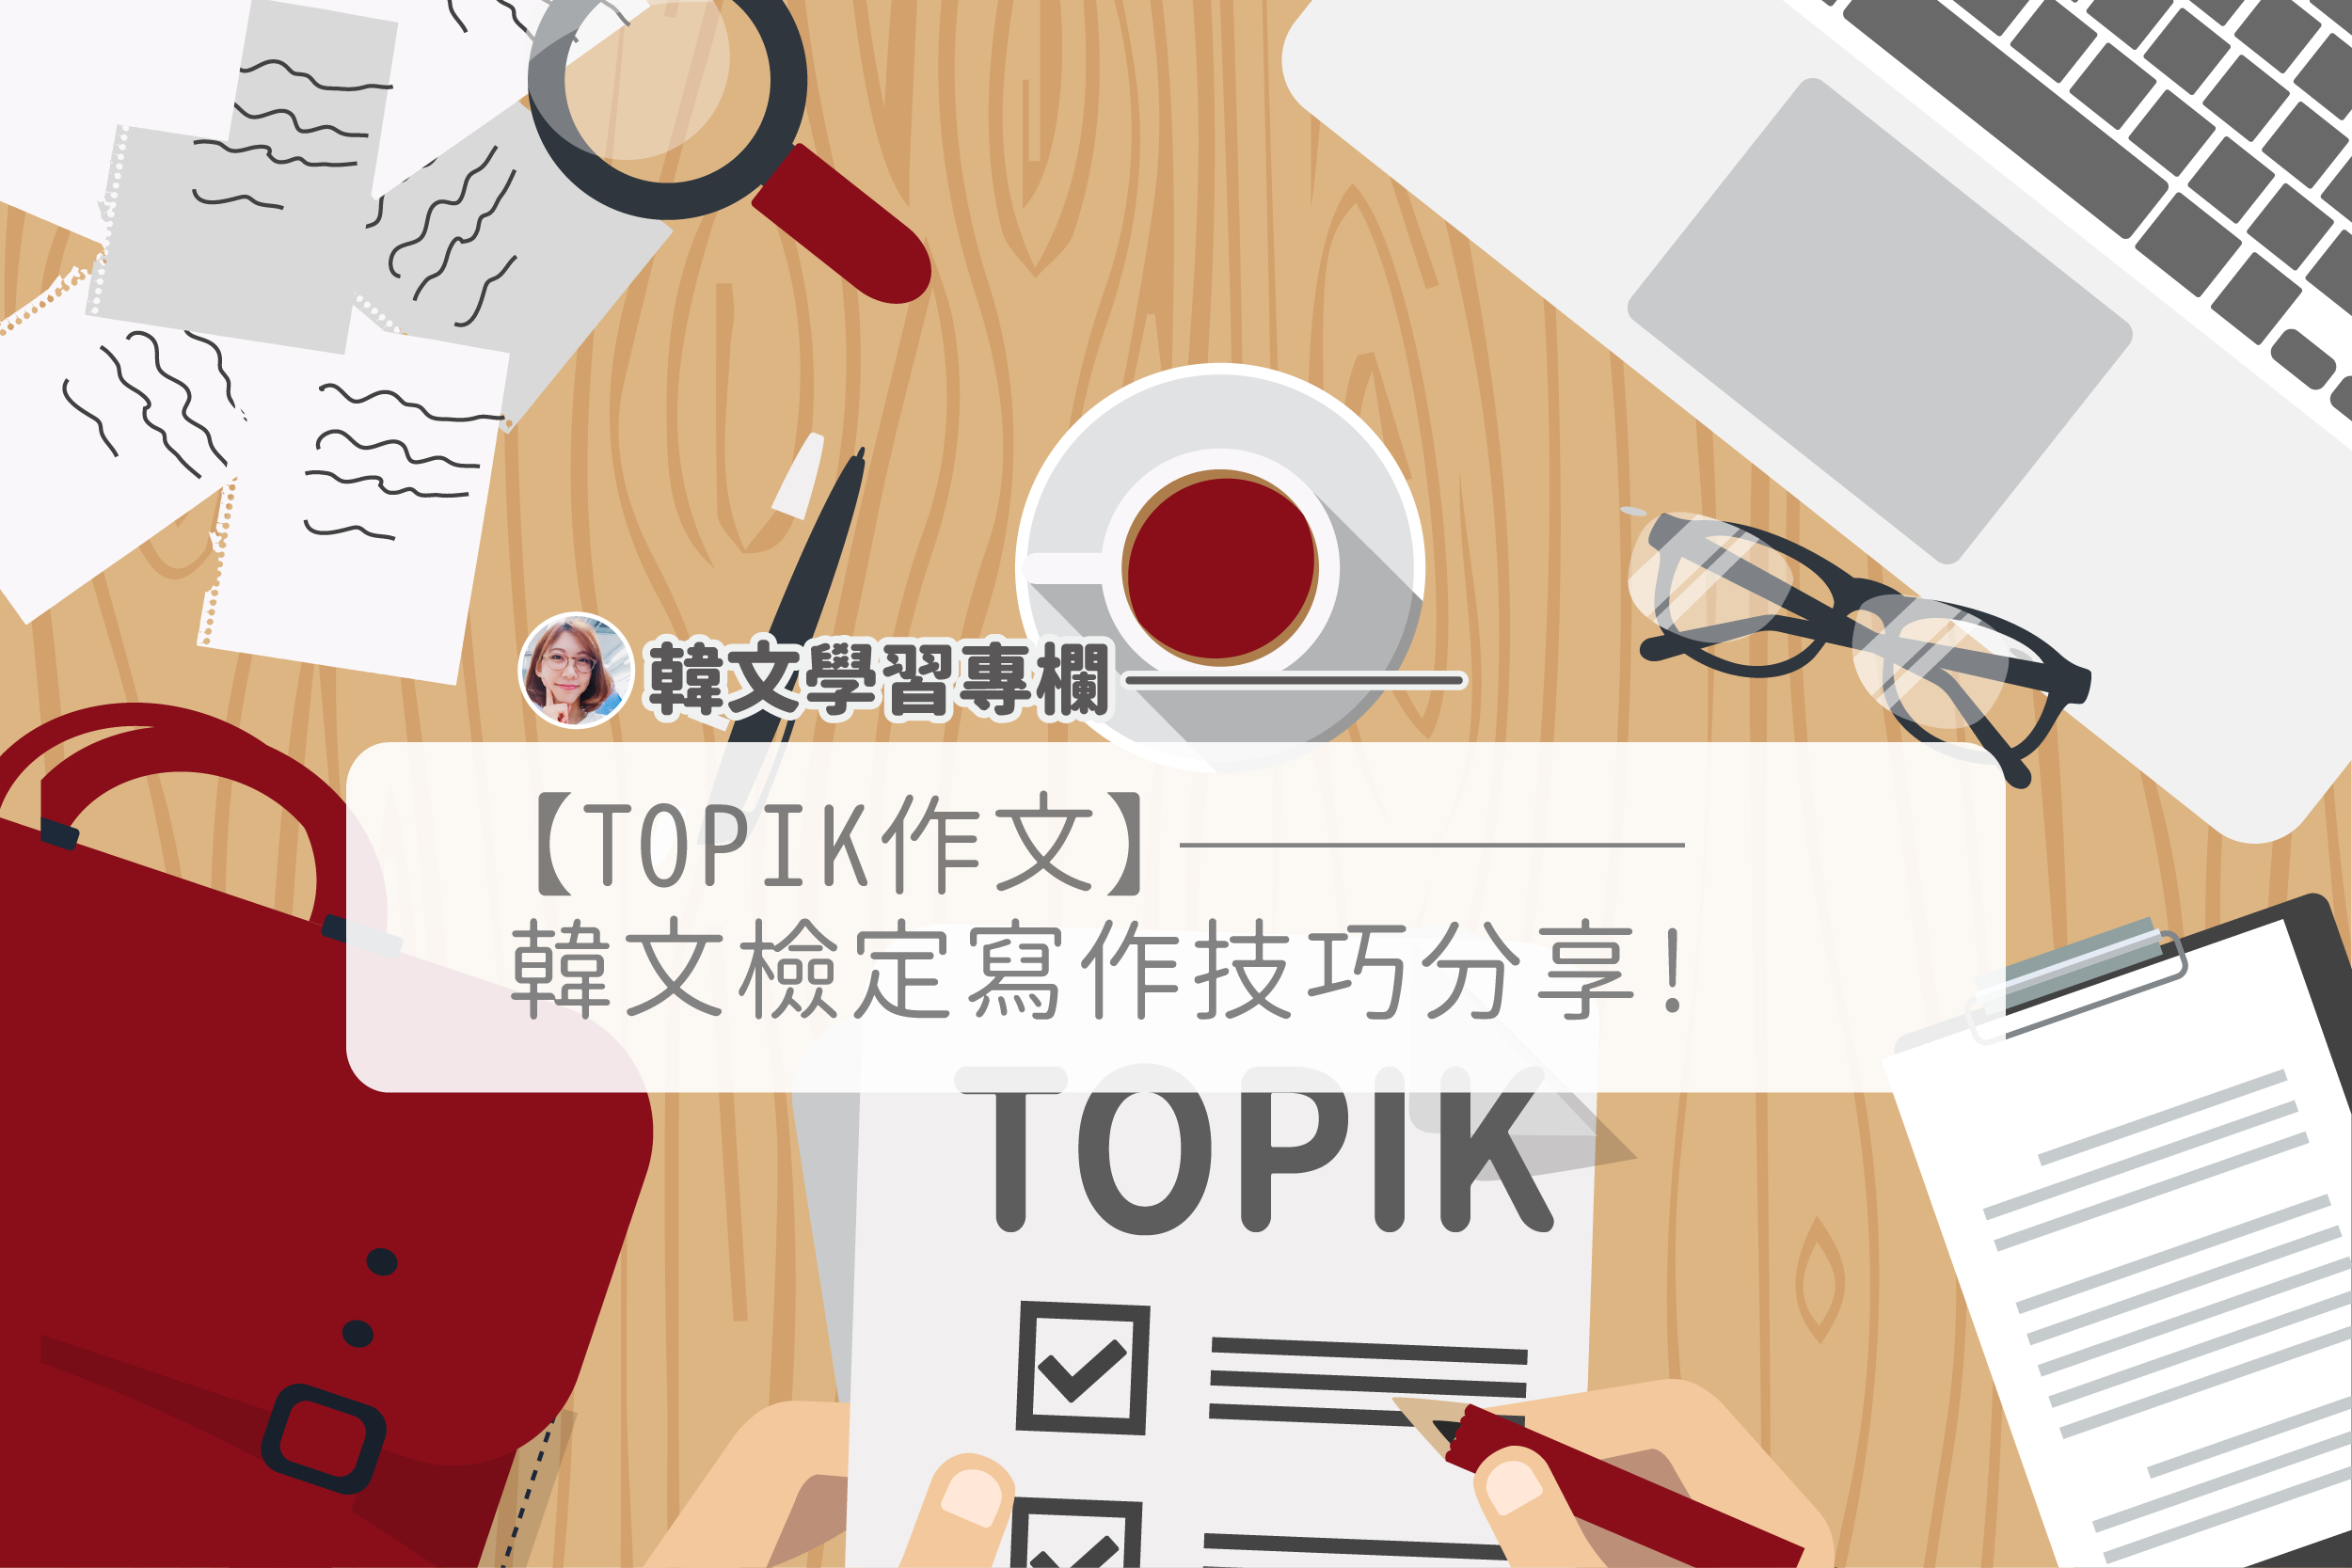 TOPIK作文-01-01.png